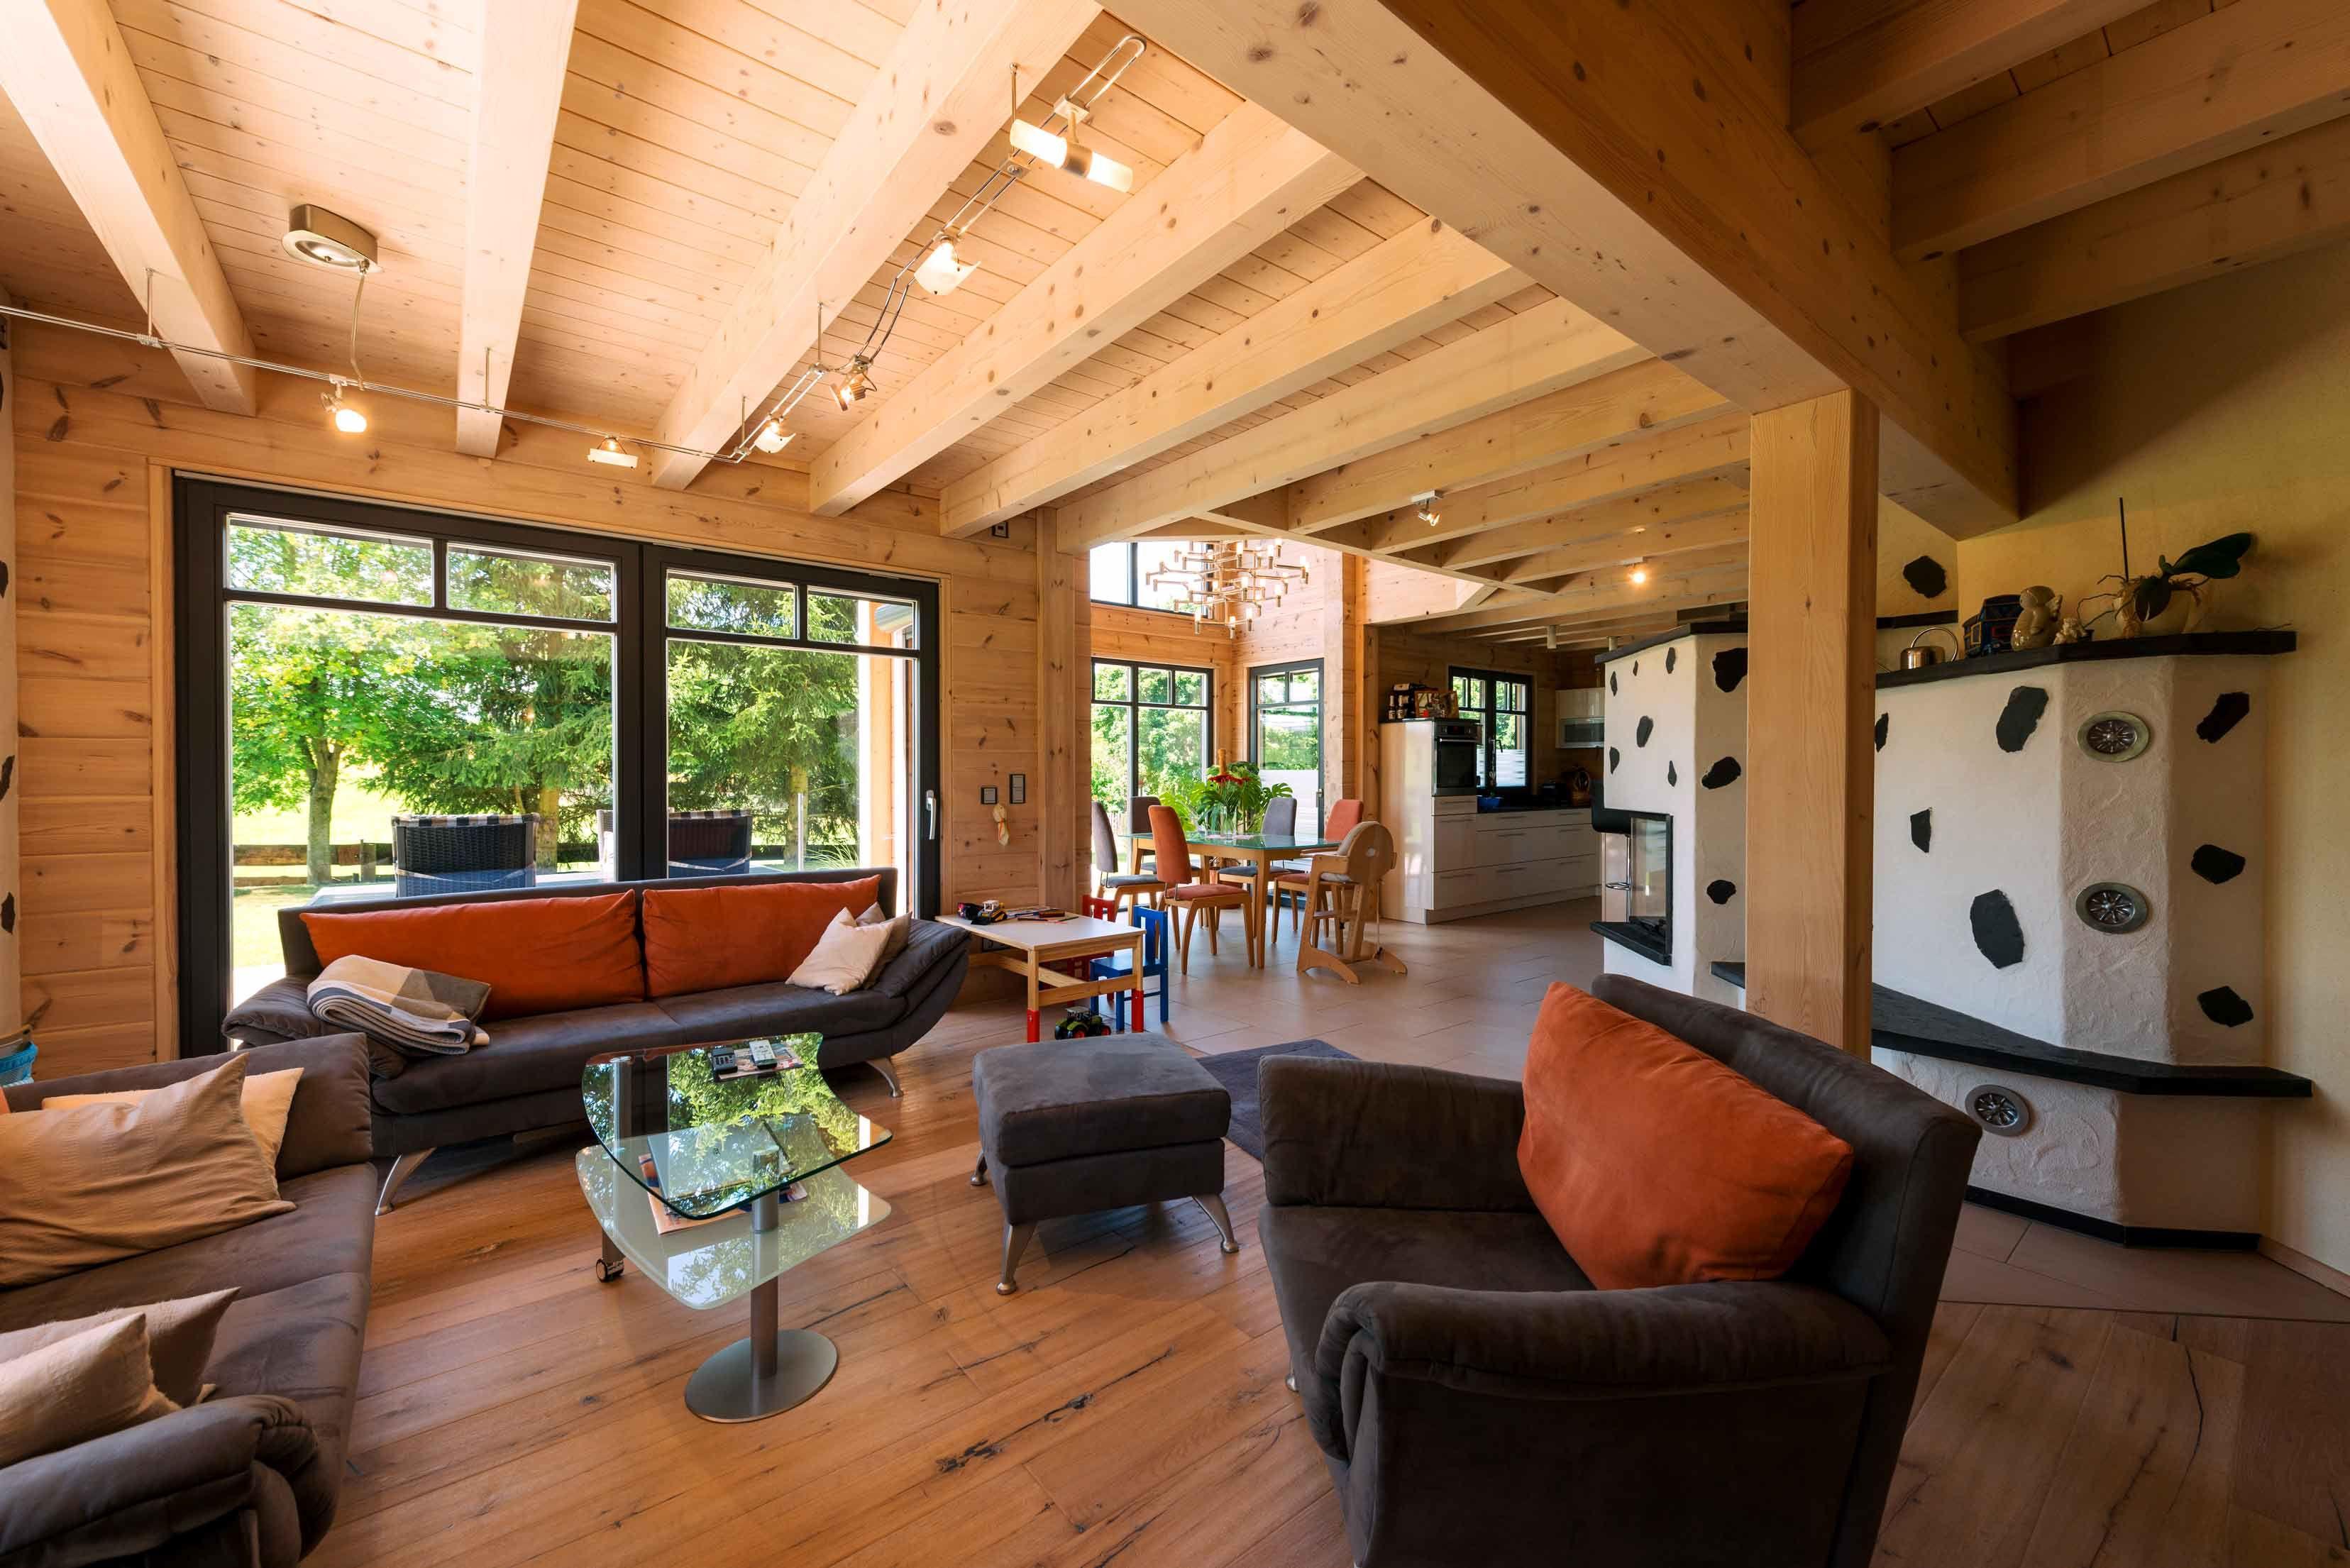 Cambridge Nouveau Alfresco By Simonds Homes #Woodleaestate #Simondshomes #Land #Houseandland